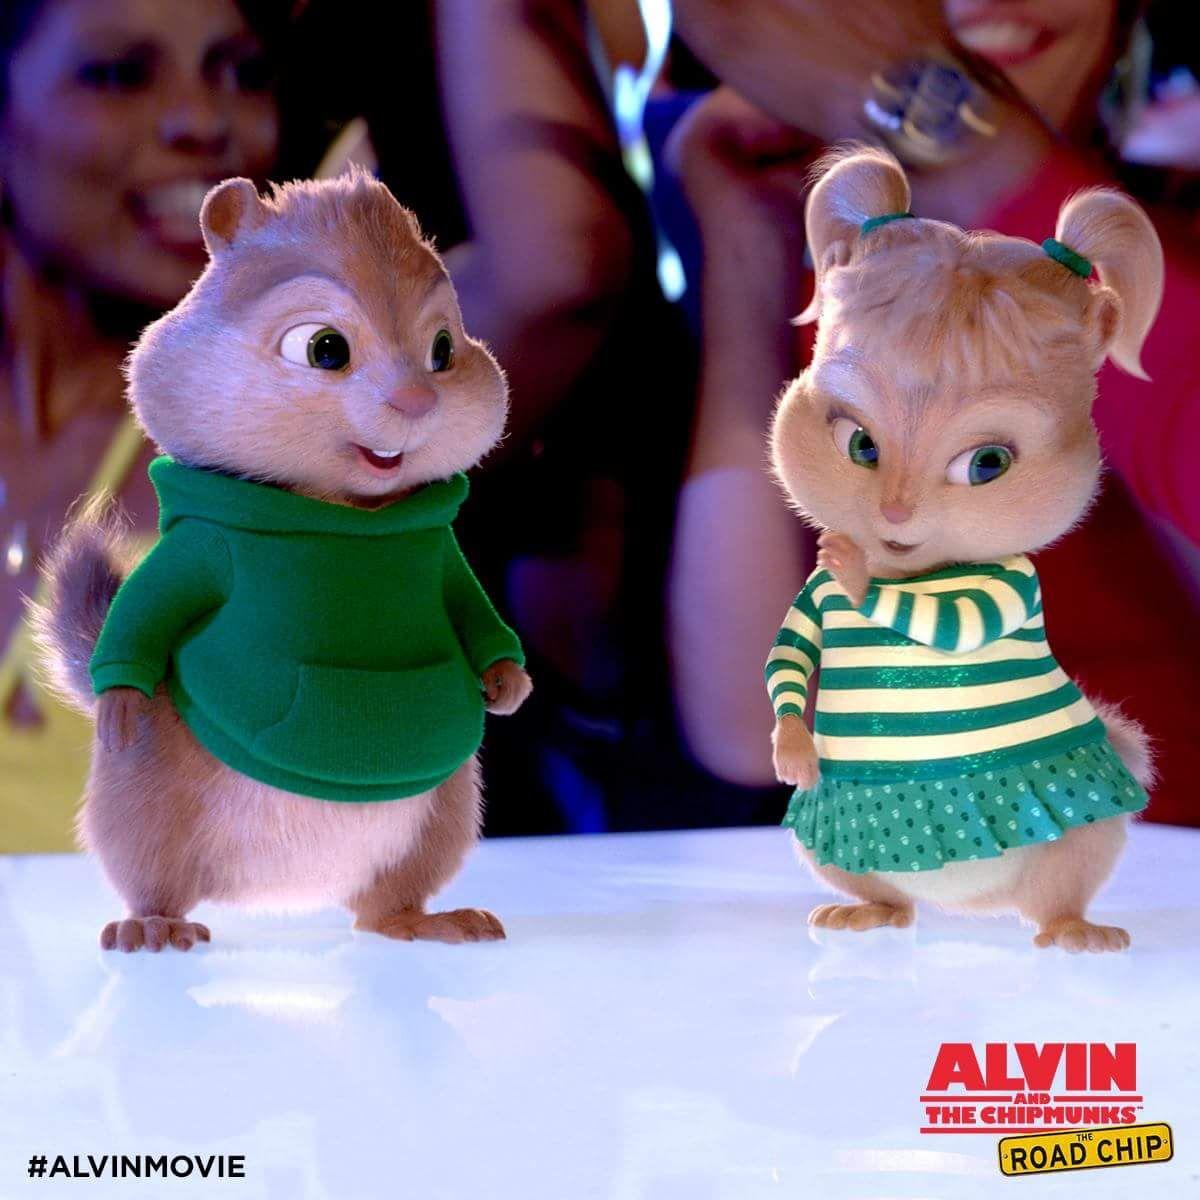 Alvin Nd Chippette Alvin And The Chipmunks Baby Chipmunk Chipmunks